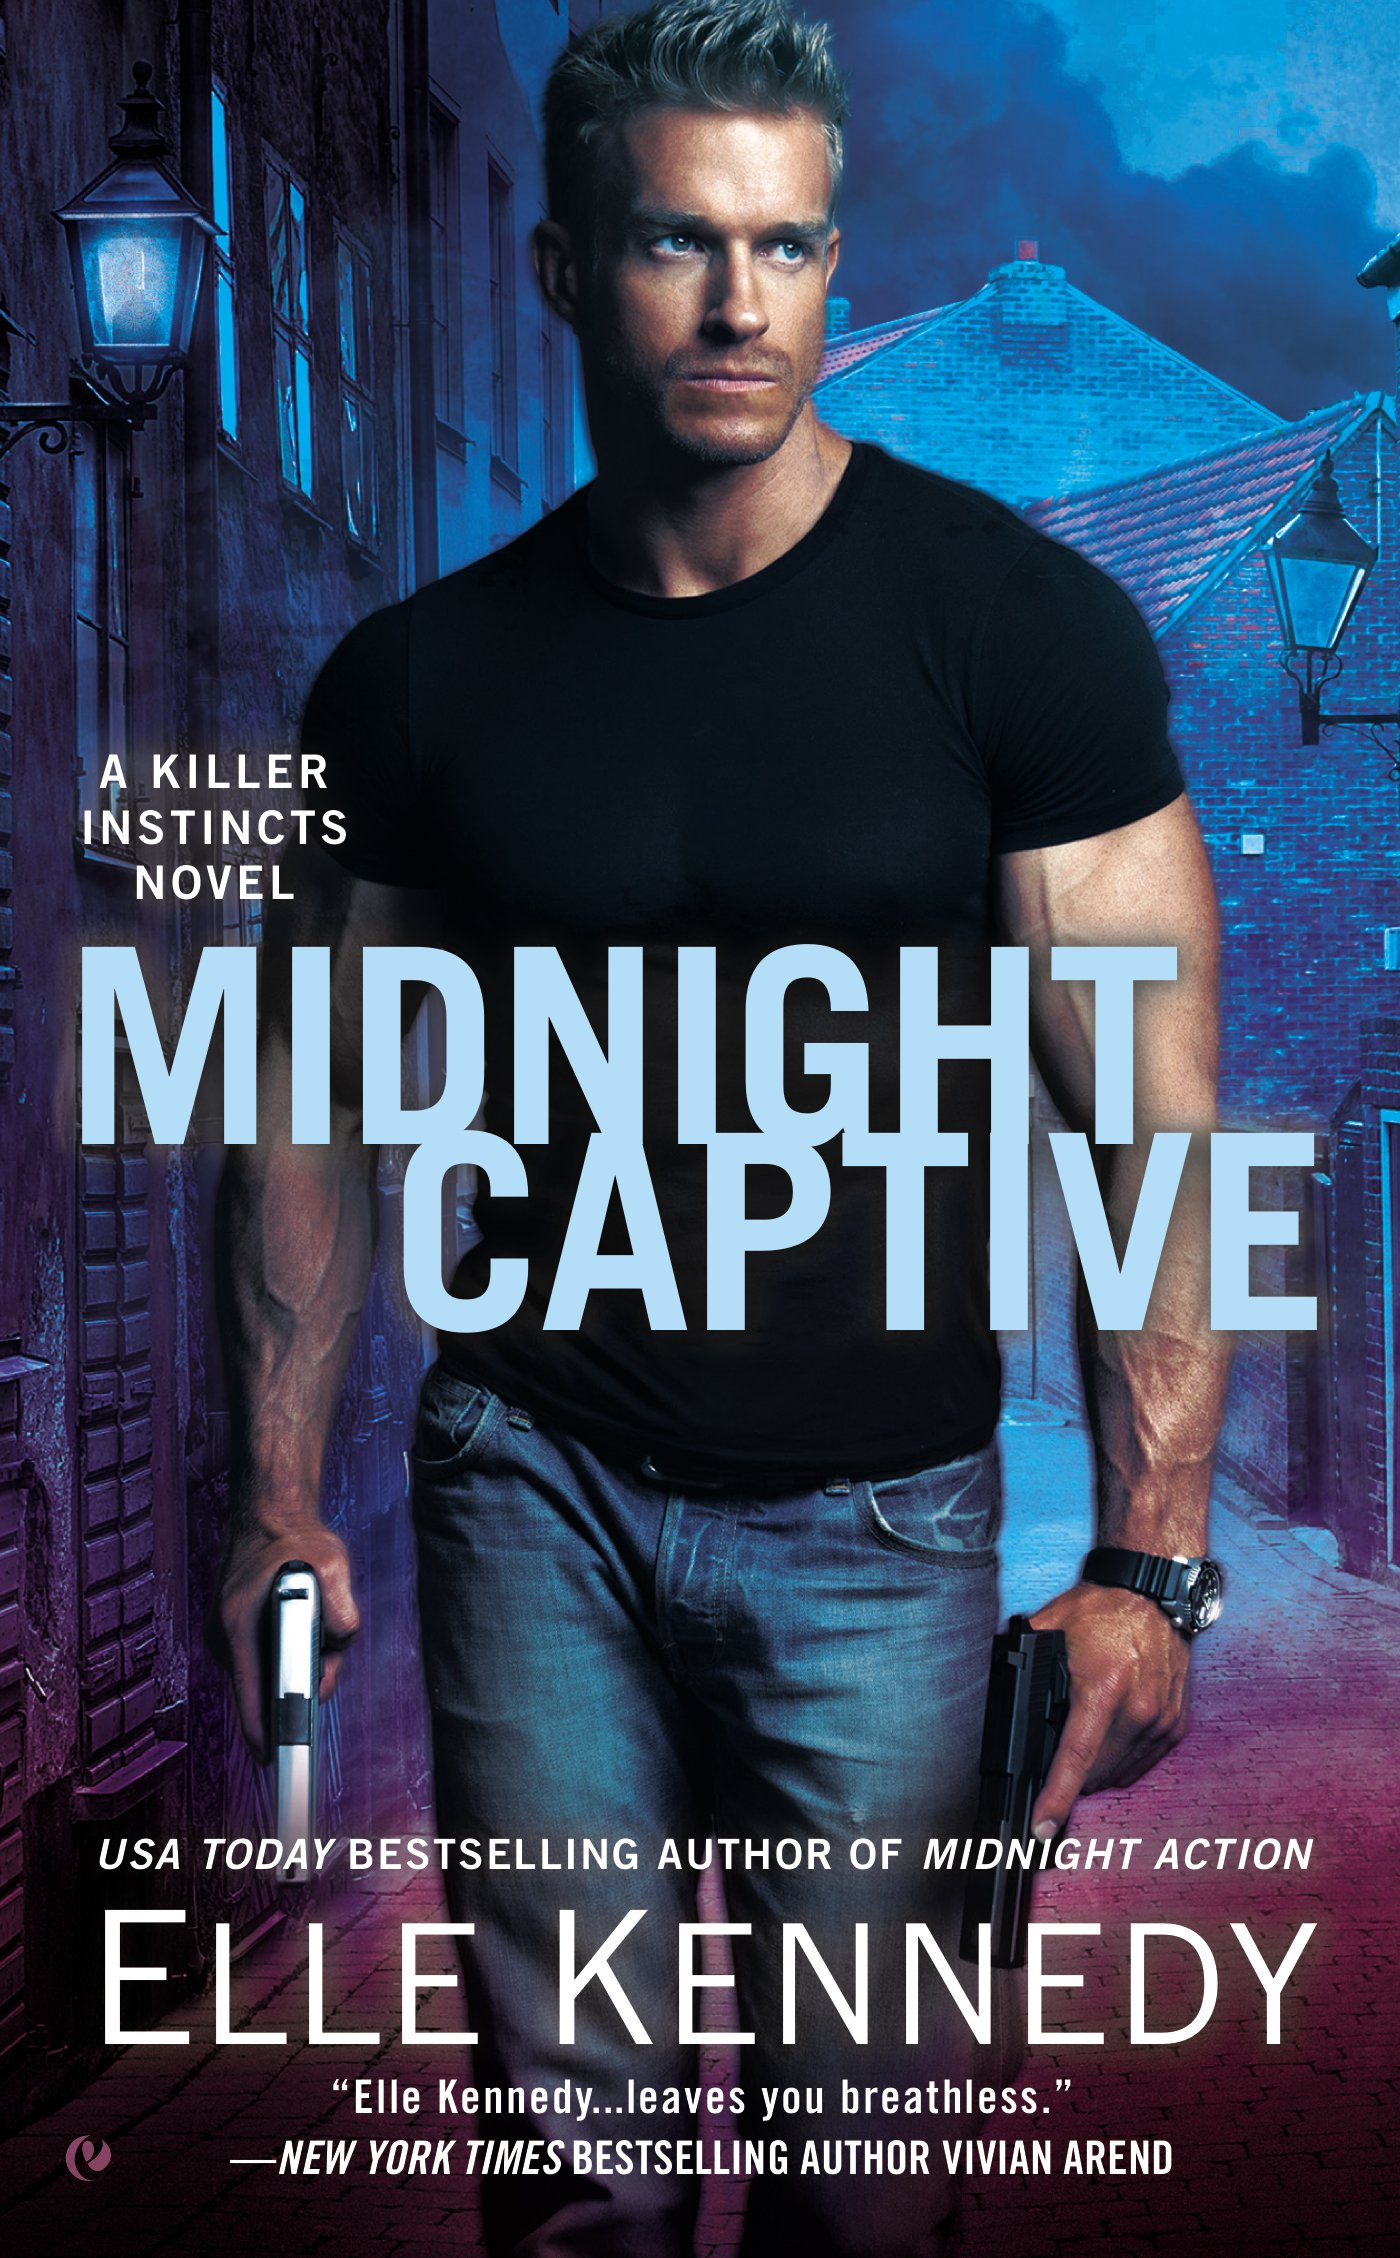 KENNEDY ELLE - Killer Instinct - tome 6 : Midnight Captive 91LBzO4zDxL